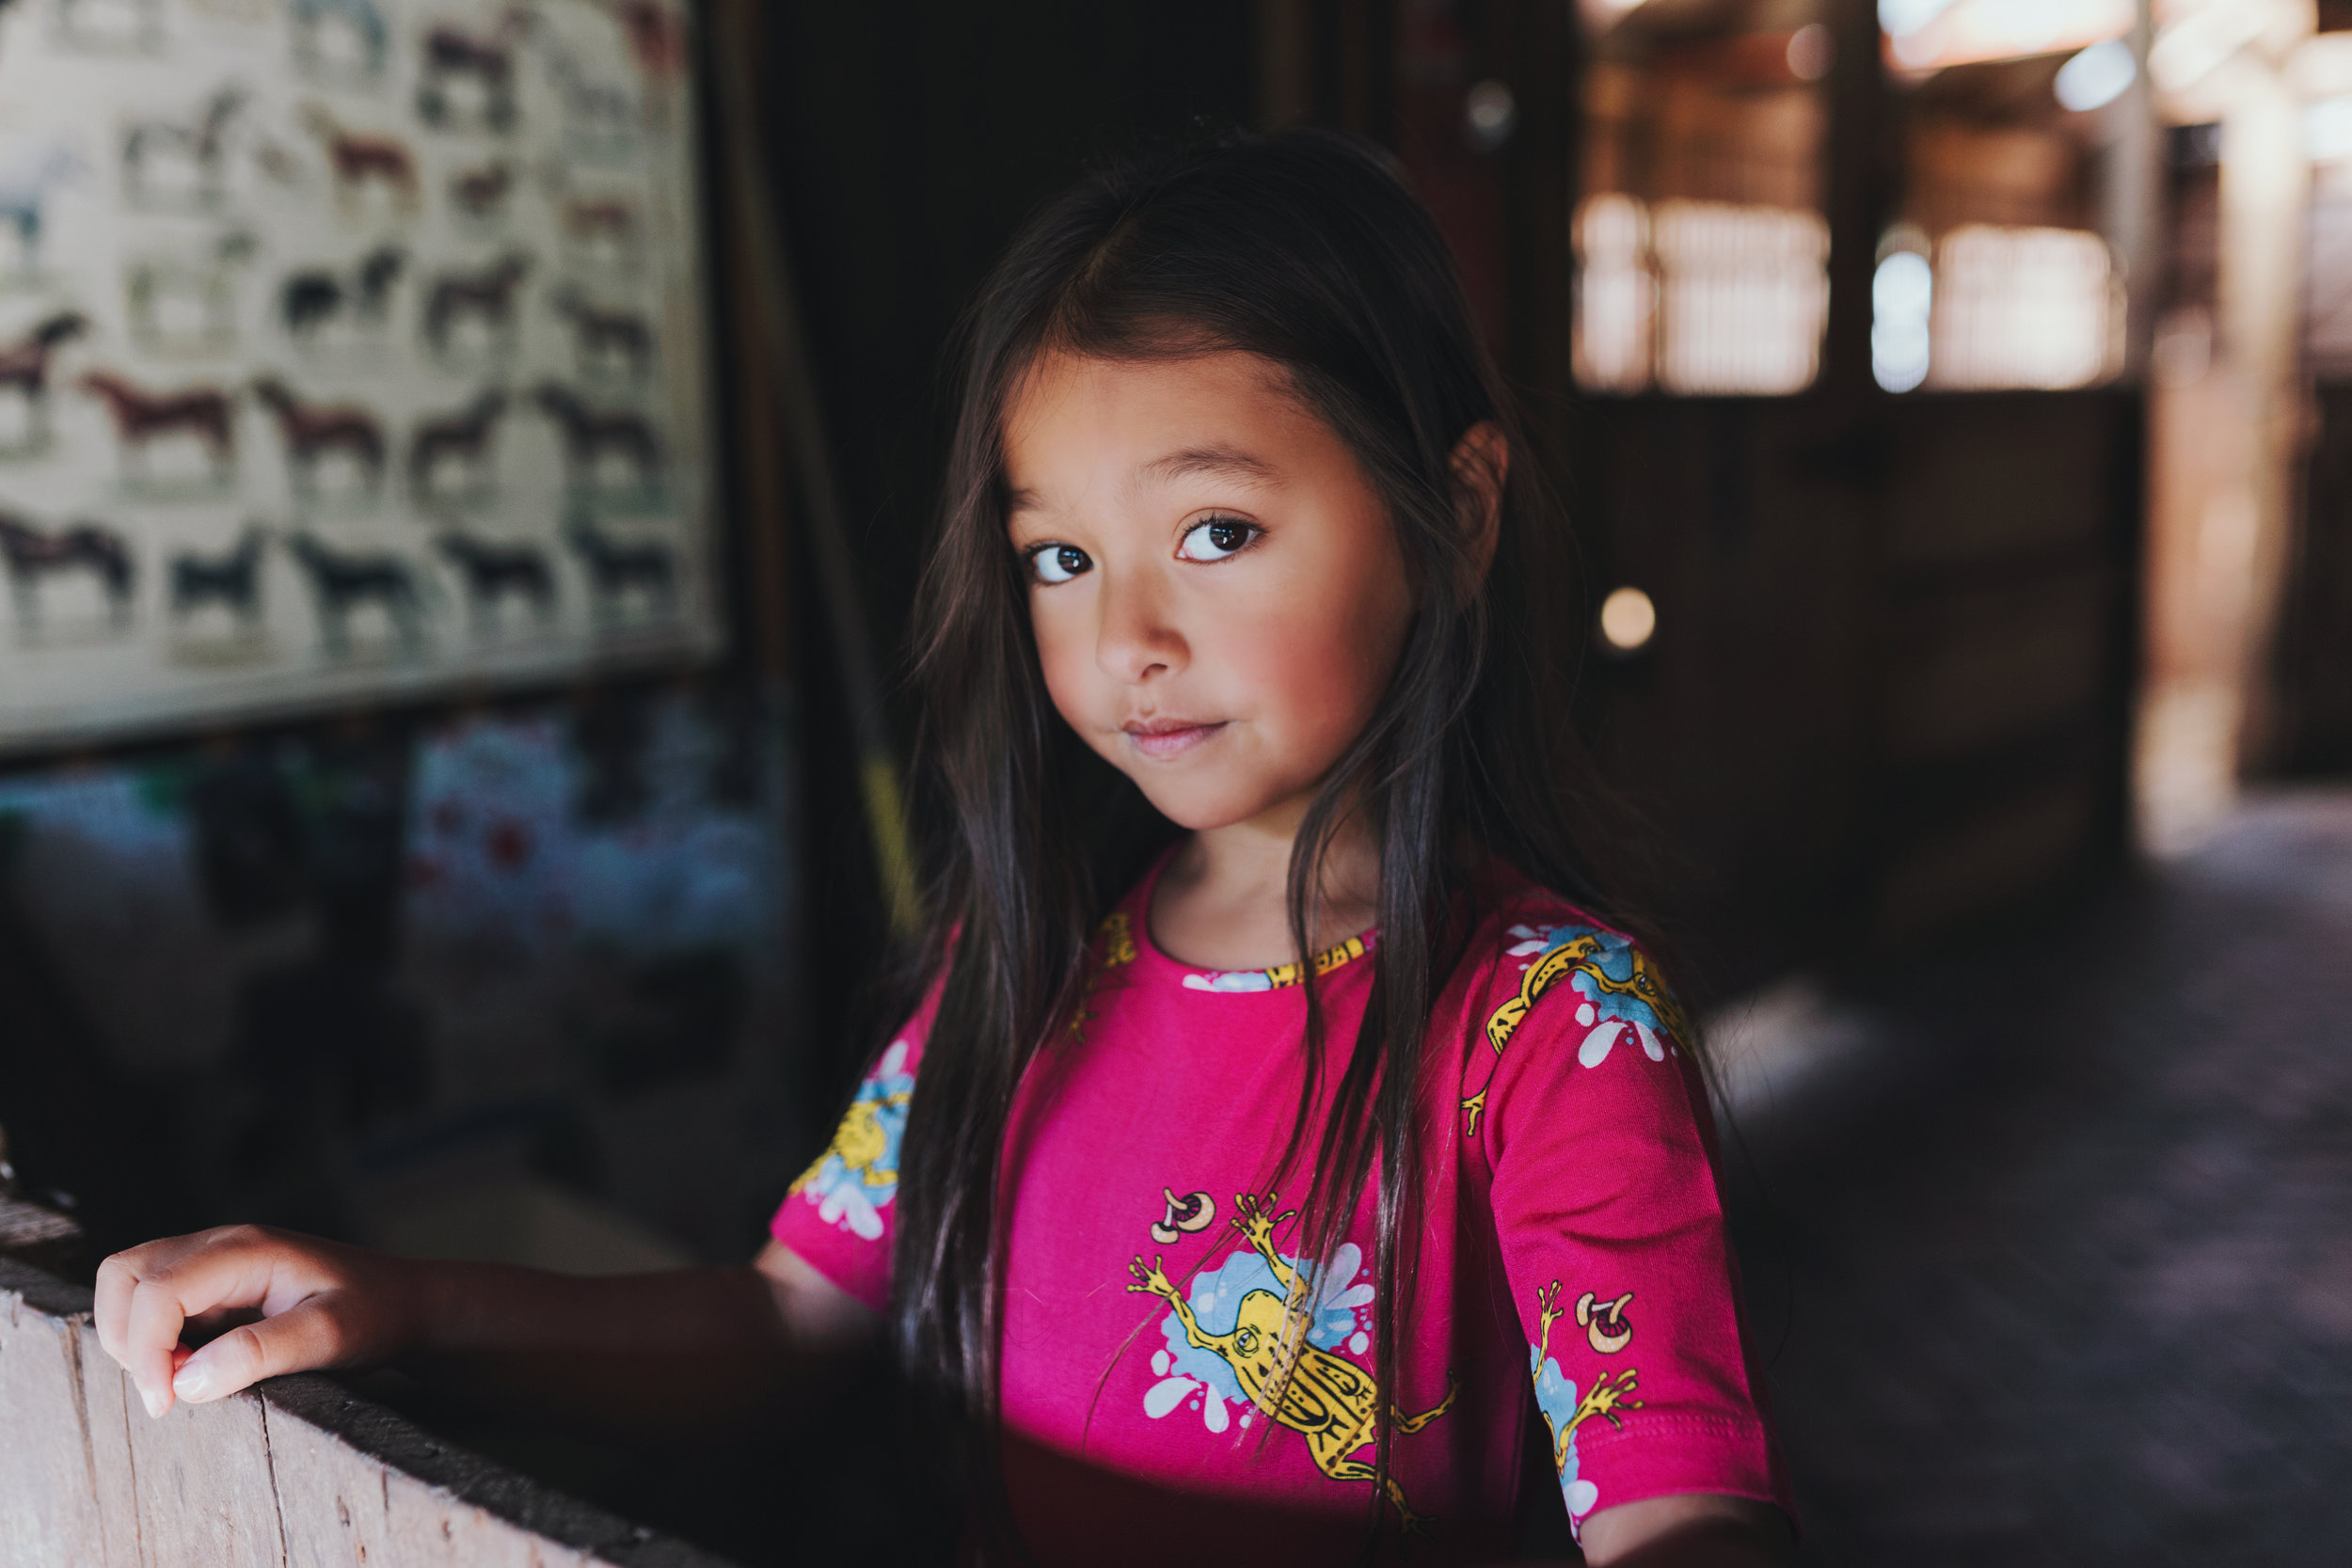 girl-pink-frog-dress-kids-commercial-photographer-siida-tasmania.jpg